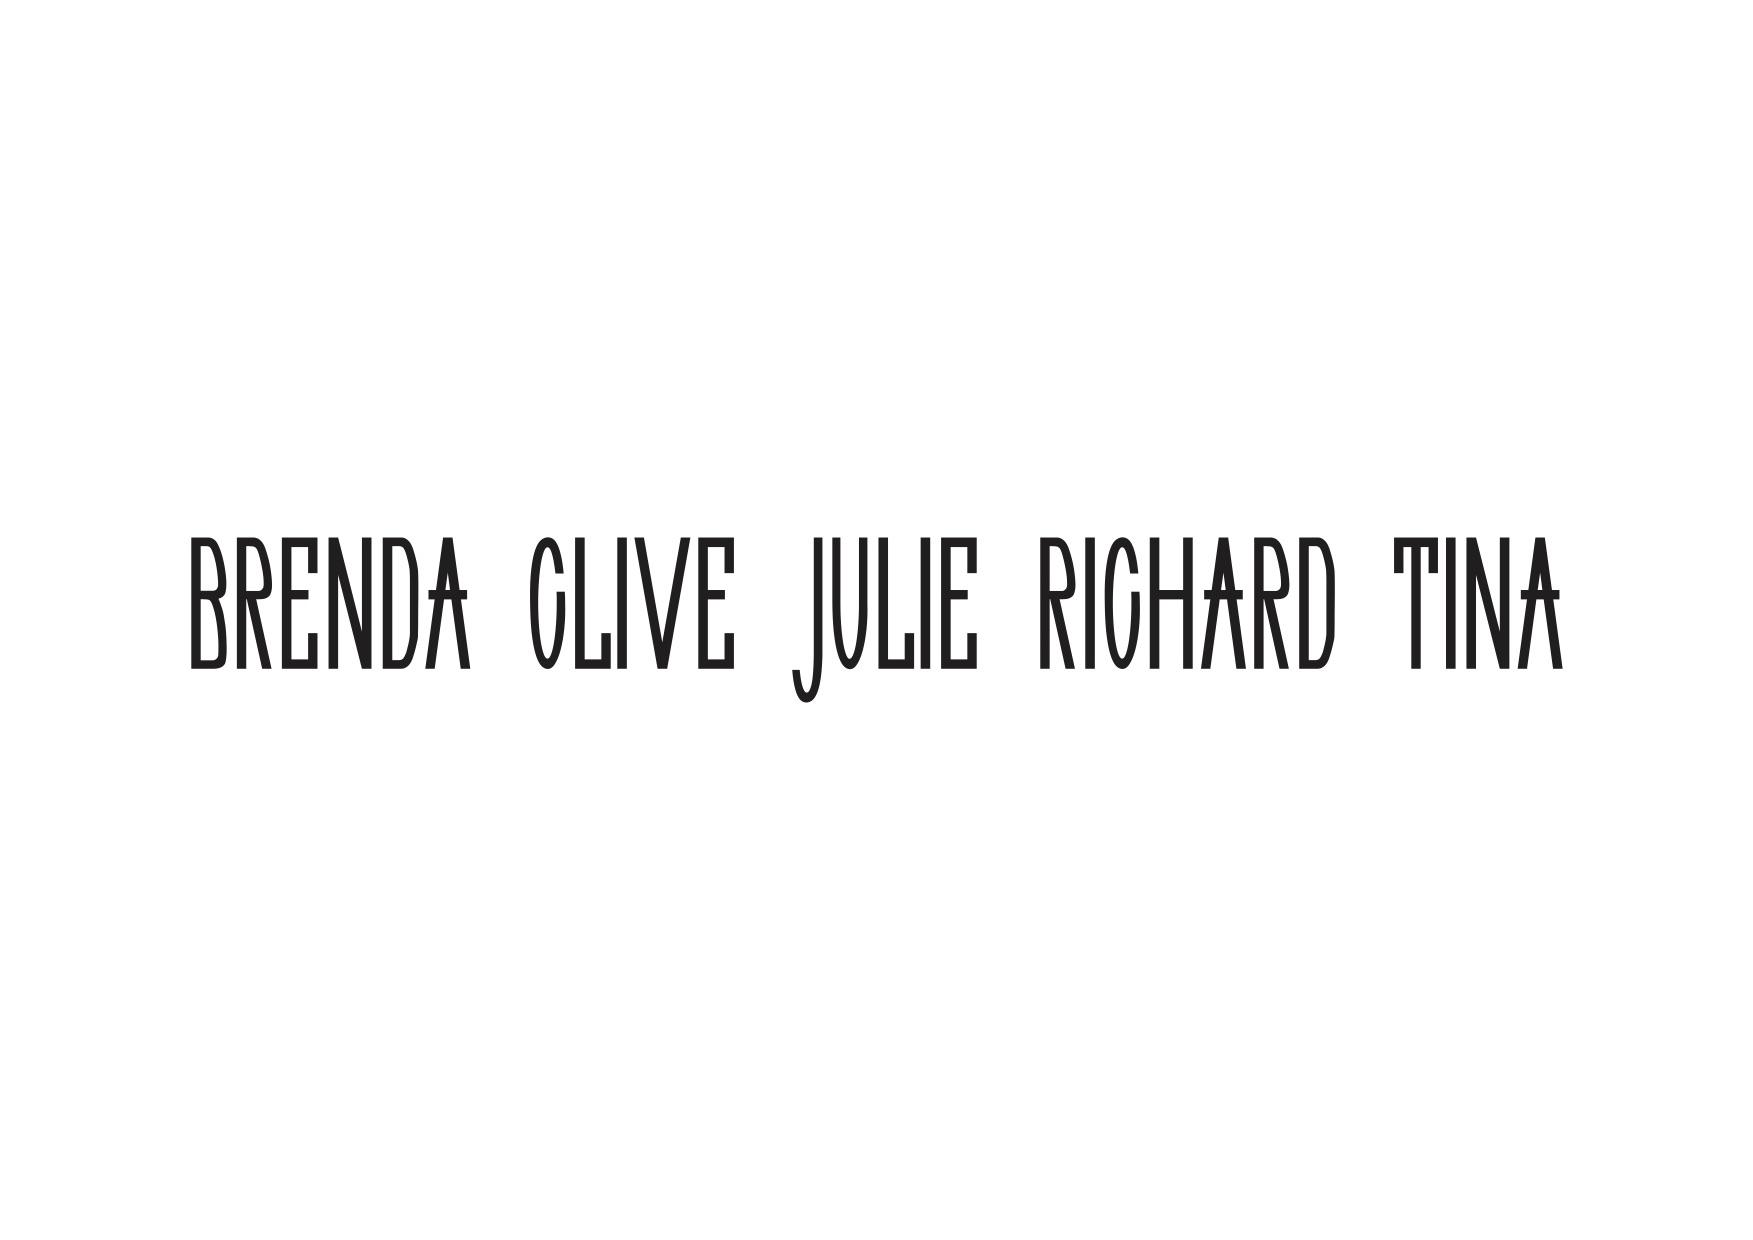 Brenda Whitehill Schlenker, Clive James, Julie Winter, Richard S. Boswell, and Tina Sparkles -